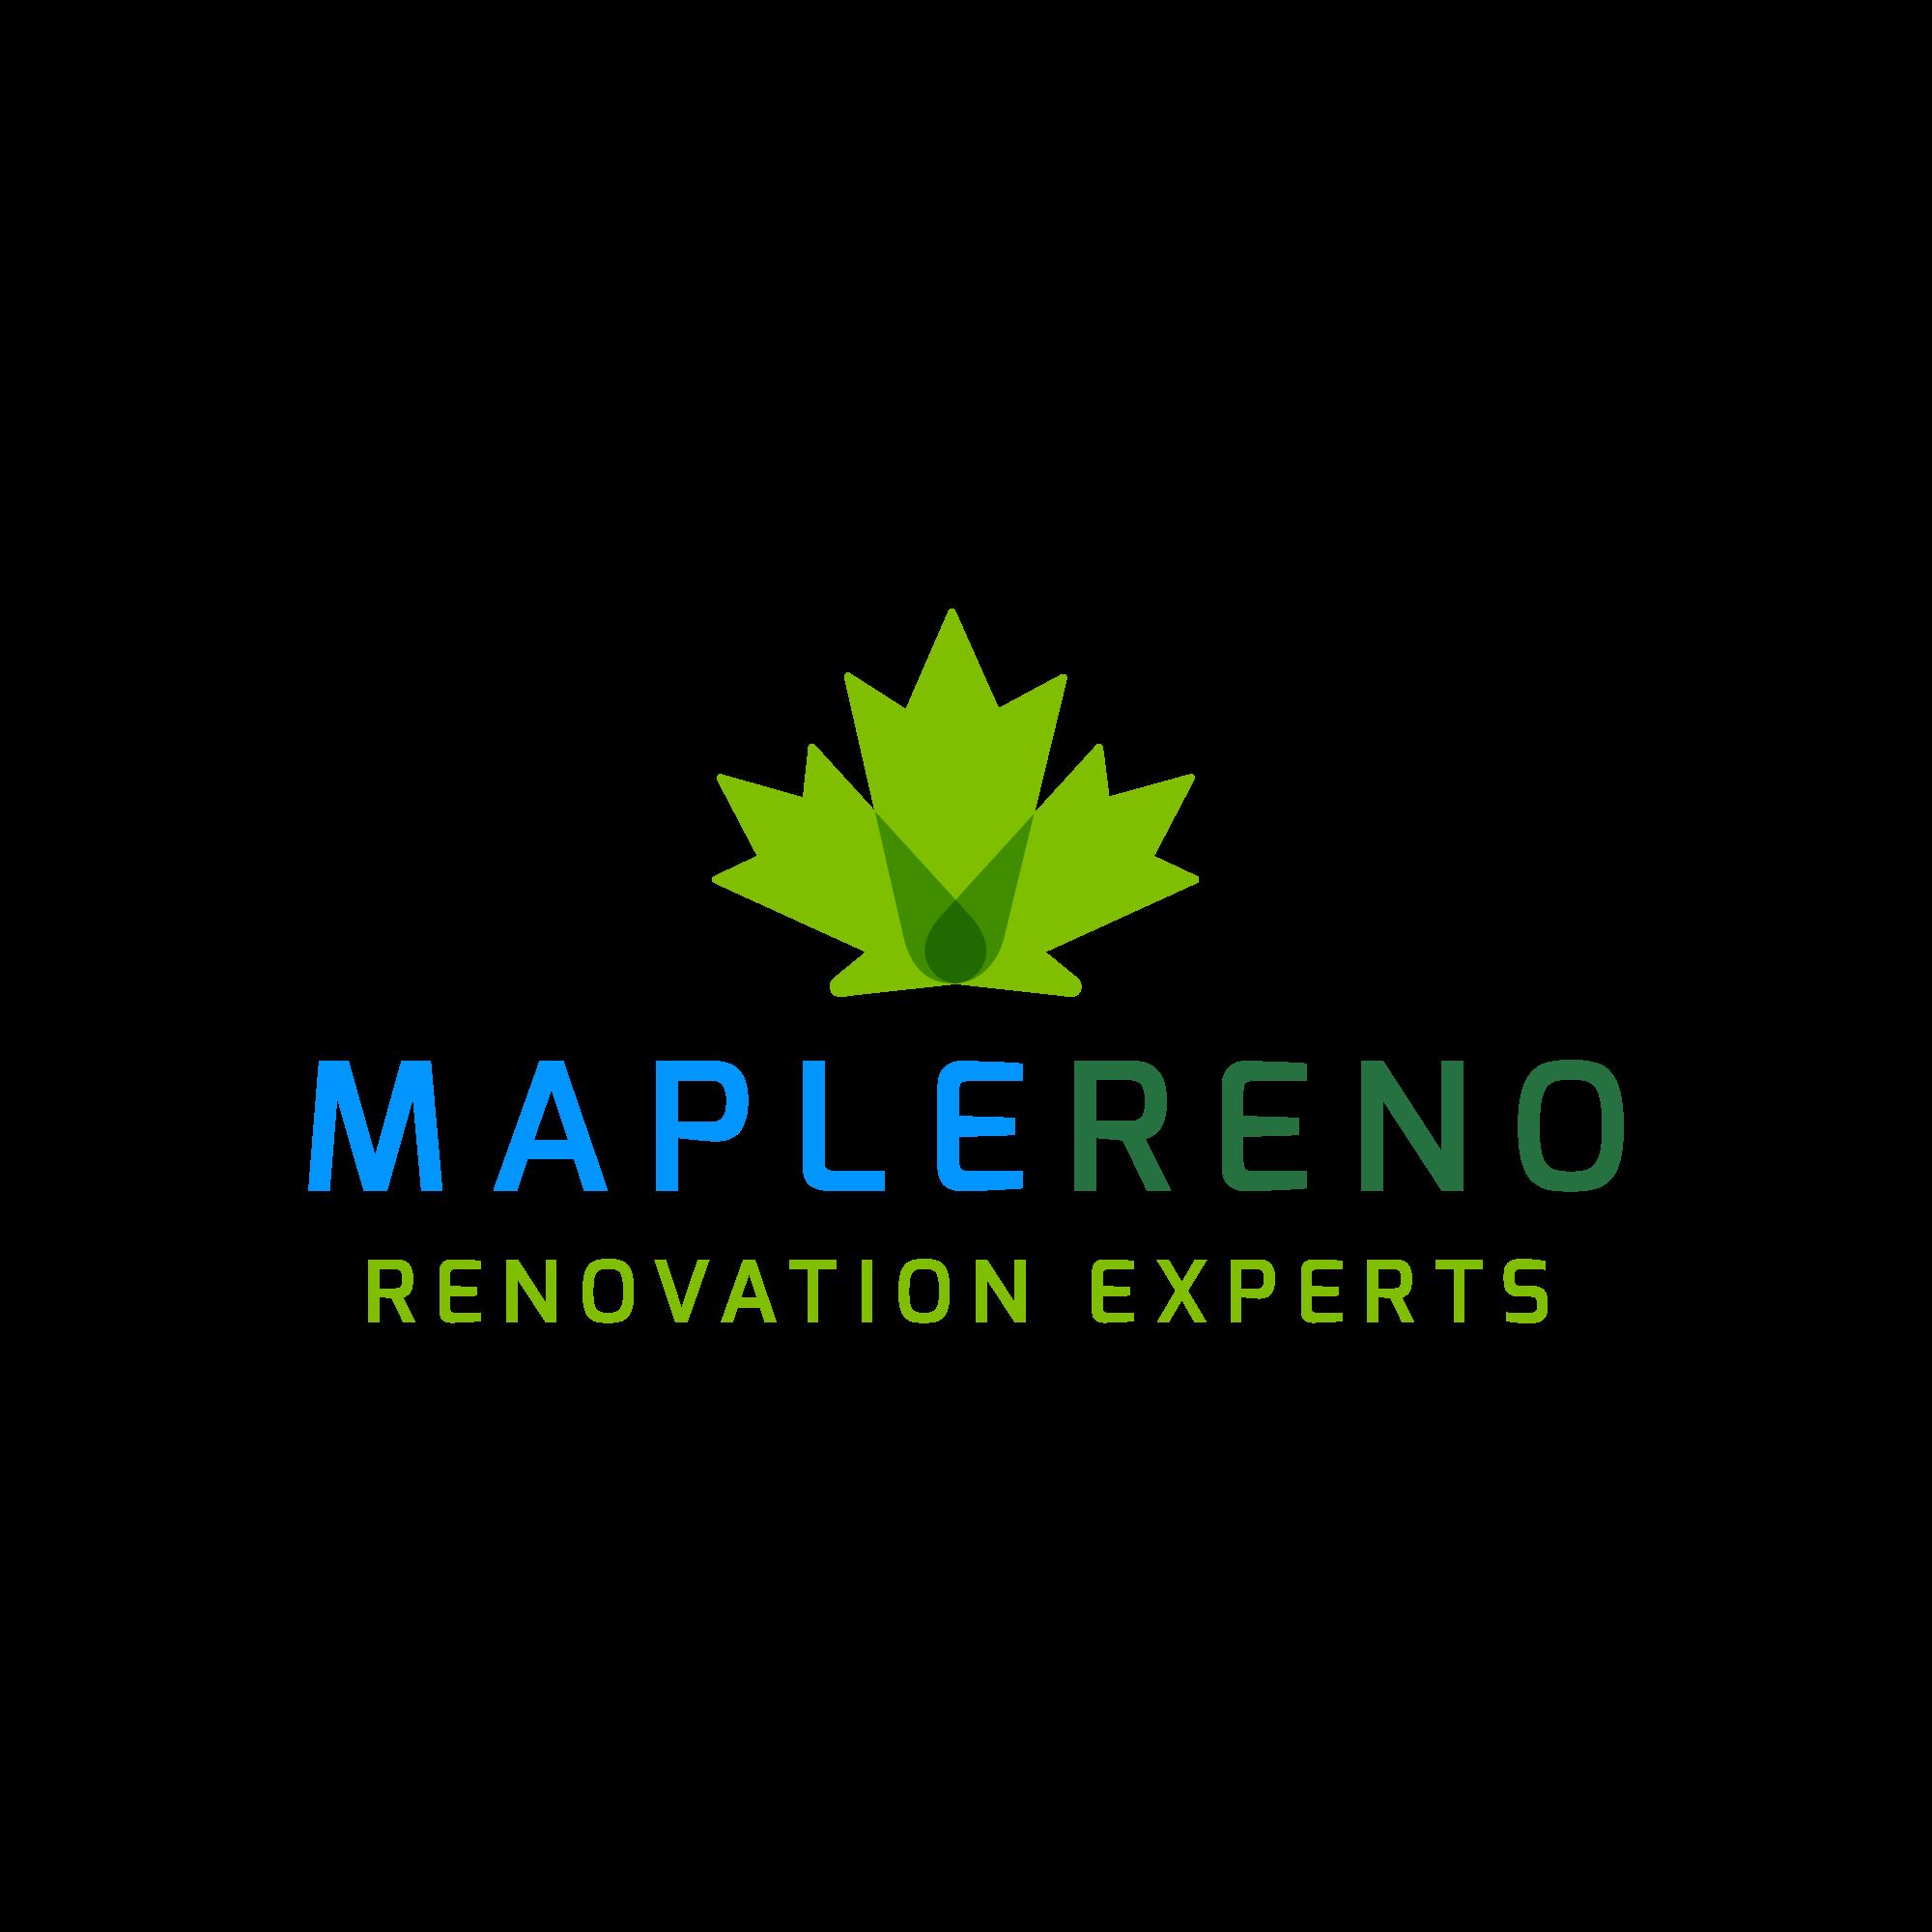 Maple Reno